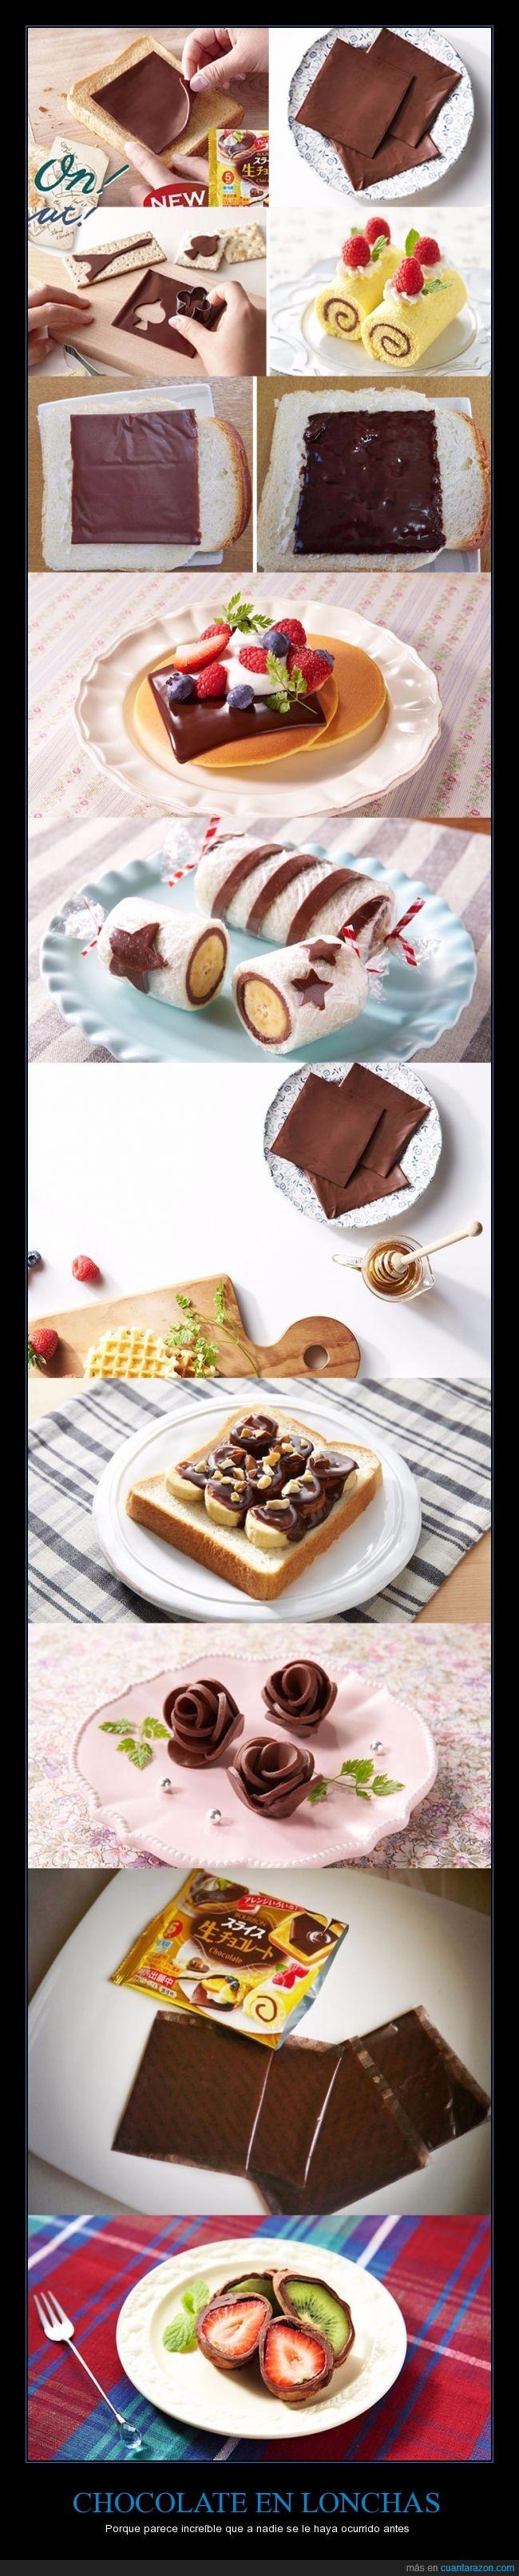 bocadillo,chocolate,Japón,lonchas,tiras